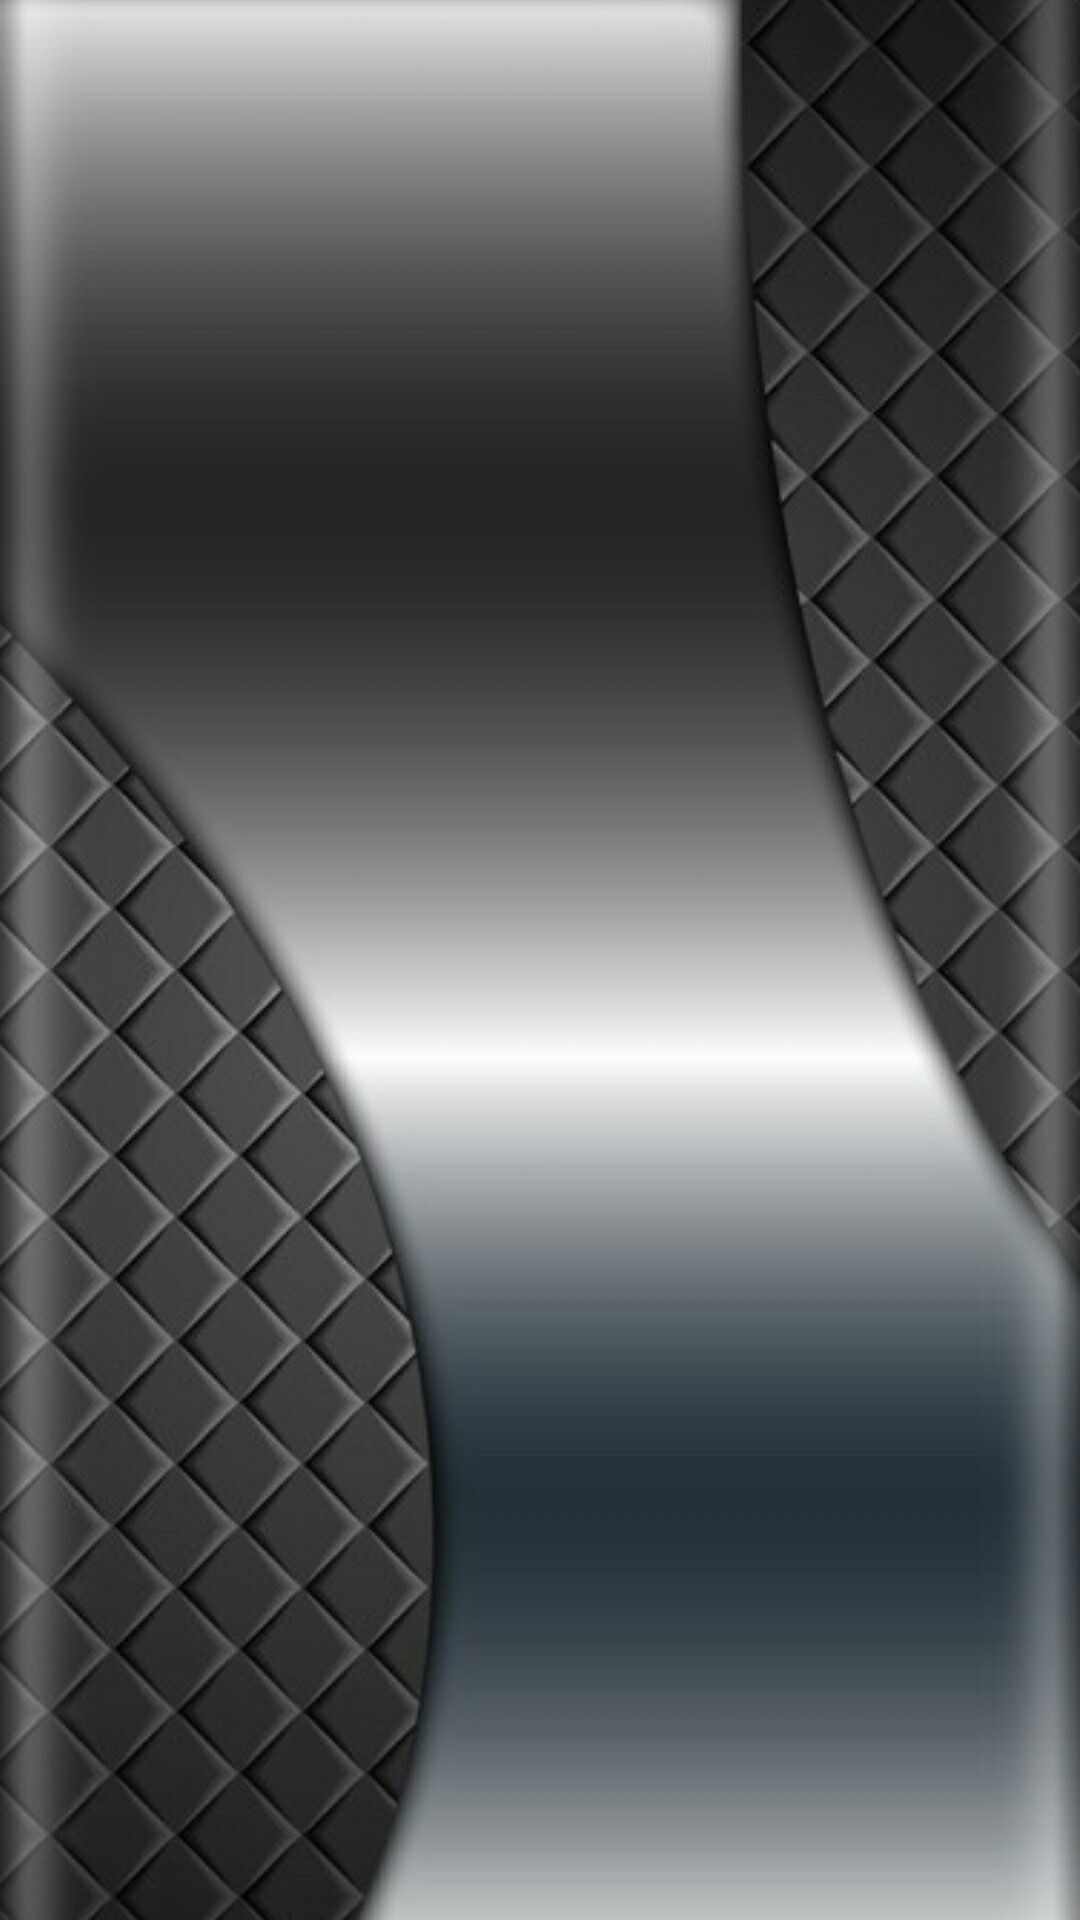 Samsung Iphone Edge Phone Telefon 3d Wallpaper Silver Wallpaper Background Wallpaper Edge Cellphone Wallpaper